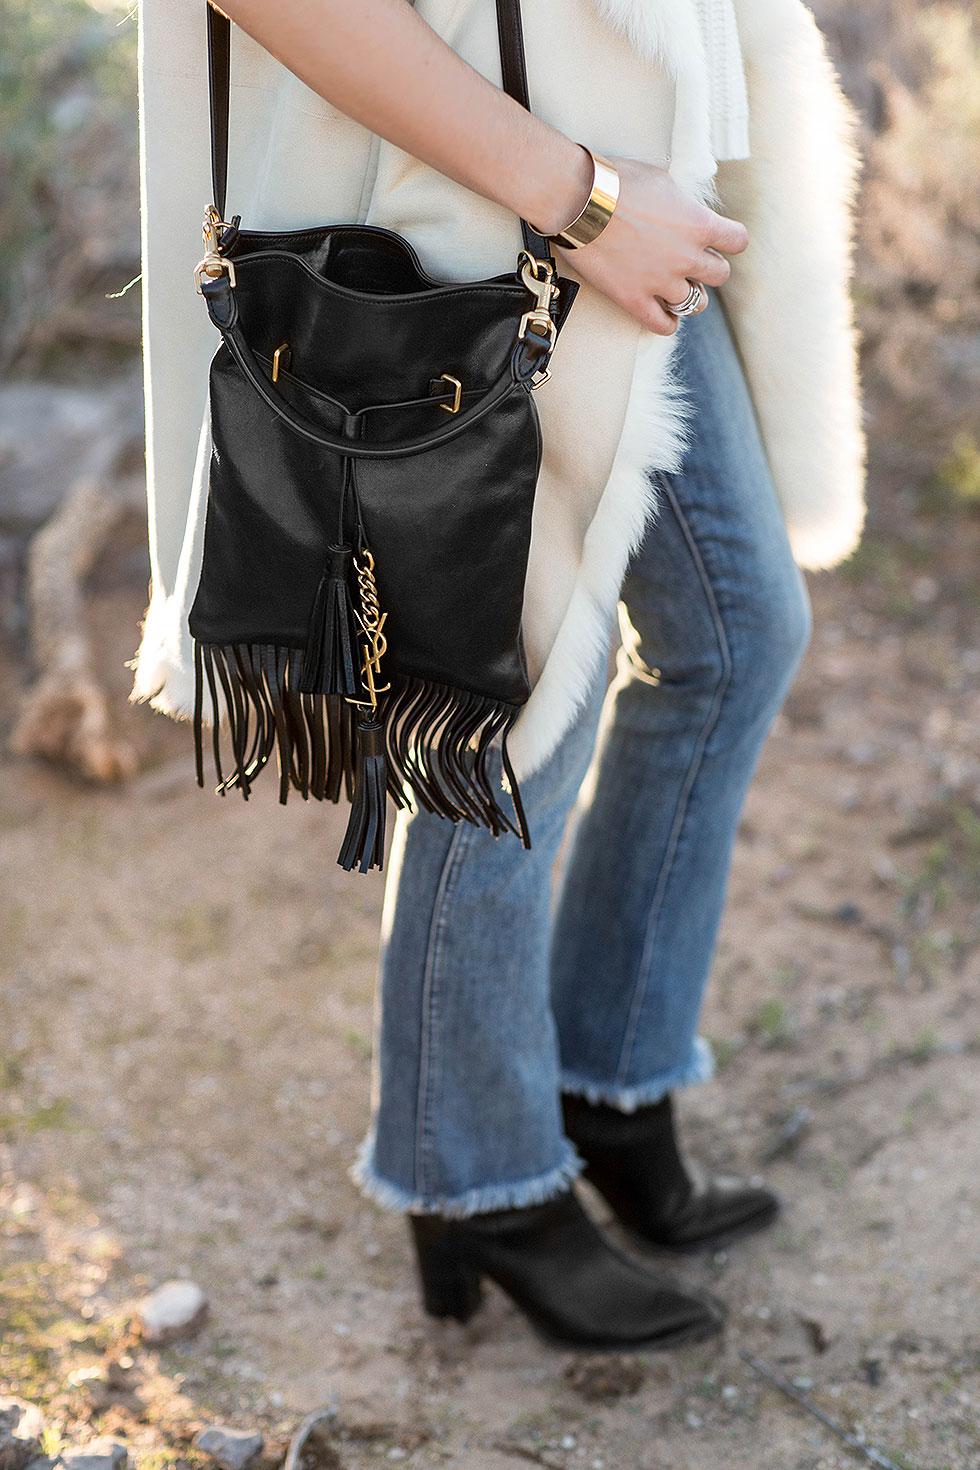 Theory Ivory Shearling Vest, Saint Laurent Monogram Fringe Bucket Bag, Madewell High Rise Cropped Jeans with Fringe Desert Outfit Arizona